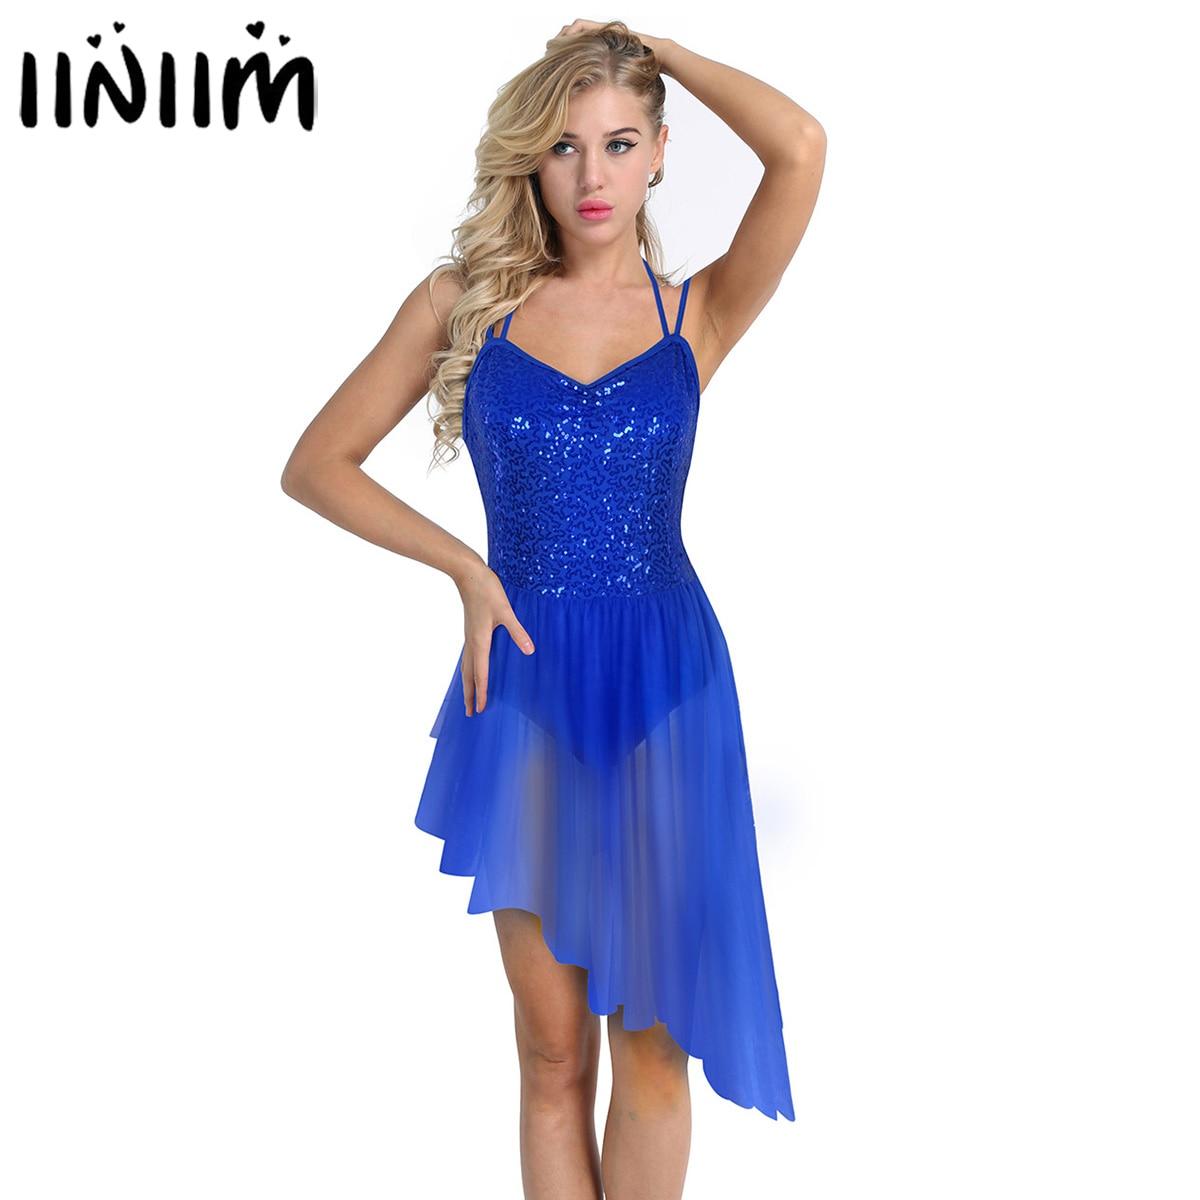 Womens Adult Costumes Ballet Dress Spaghetti Straps Sequins Irregular Tulle Ballet Dancewear Gymnastics Leotard Bailarina Dress